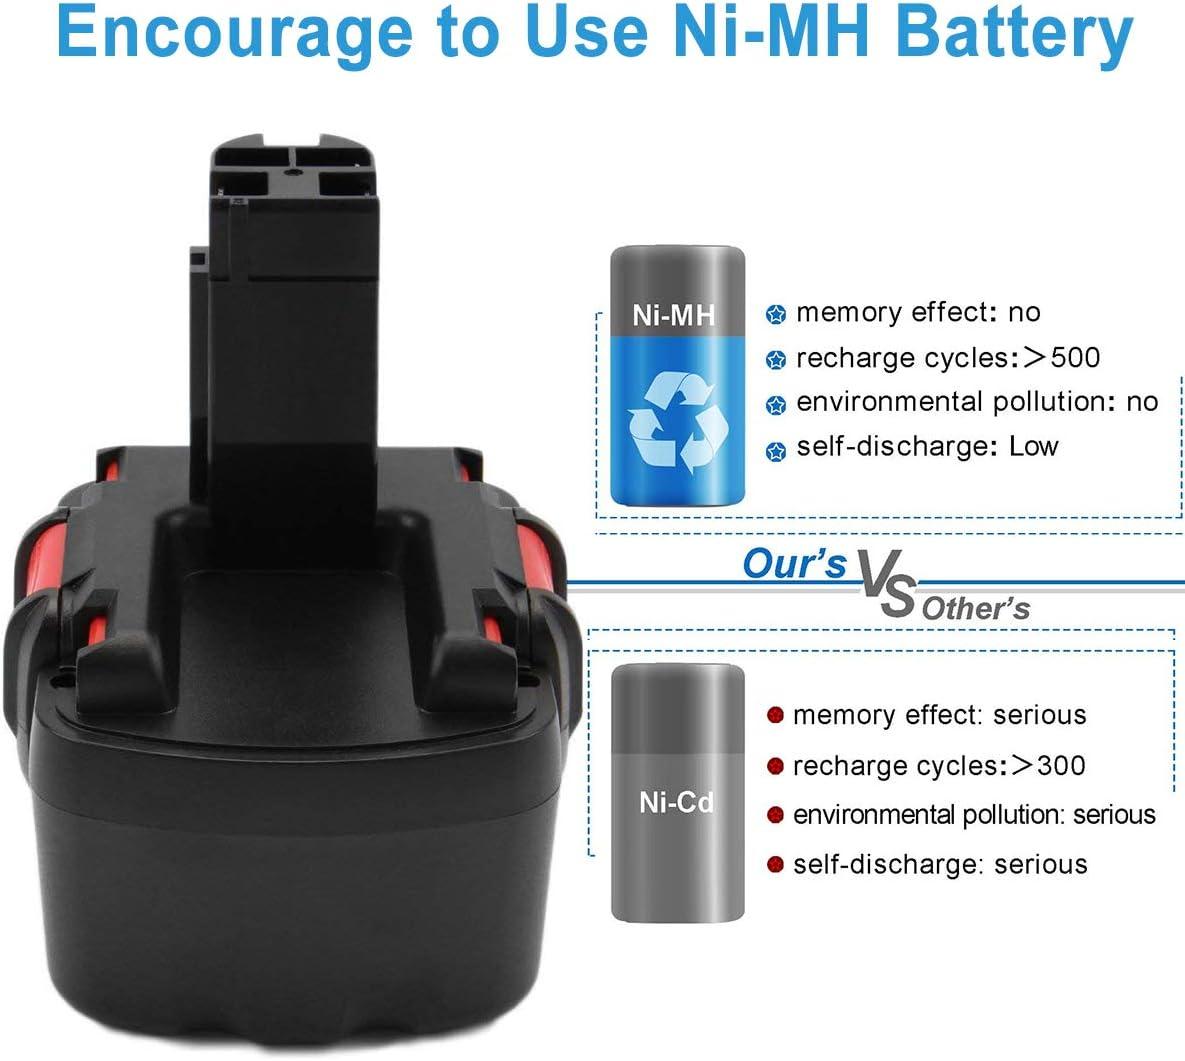 Topbatt 14.4V 3.0Ah pour Bosch batterie de remplacement Ni-MH BAT038 BAT040 BAT0